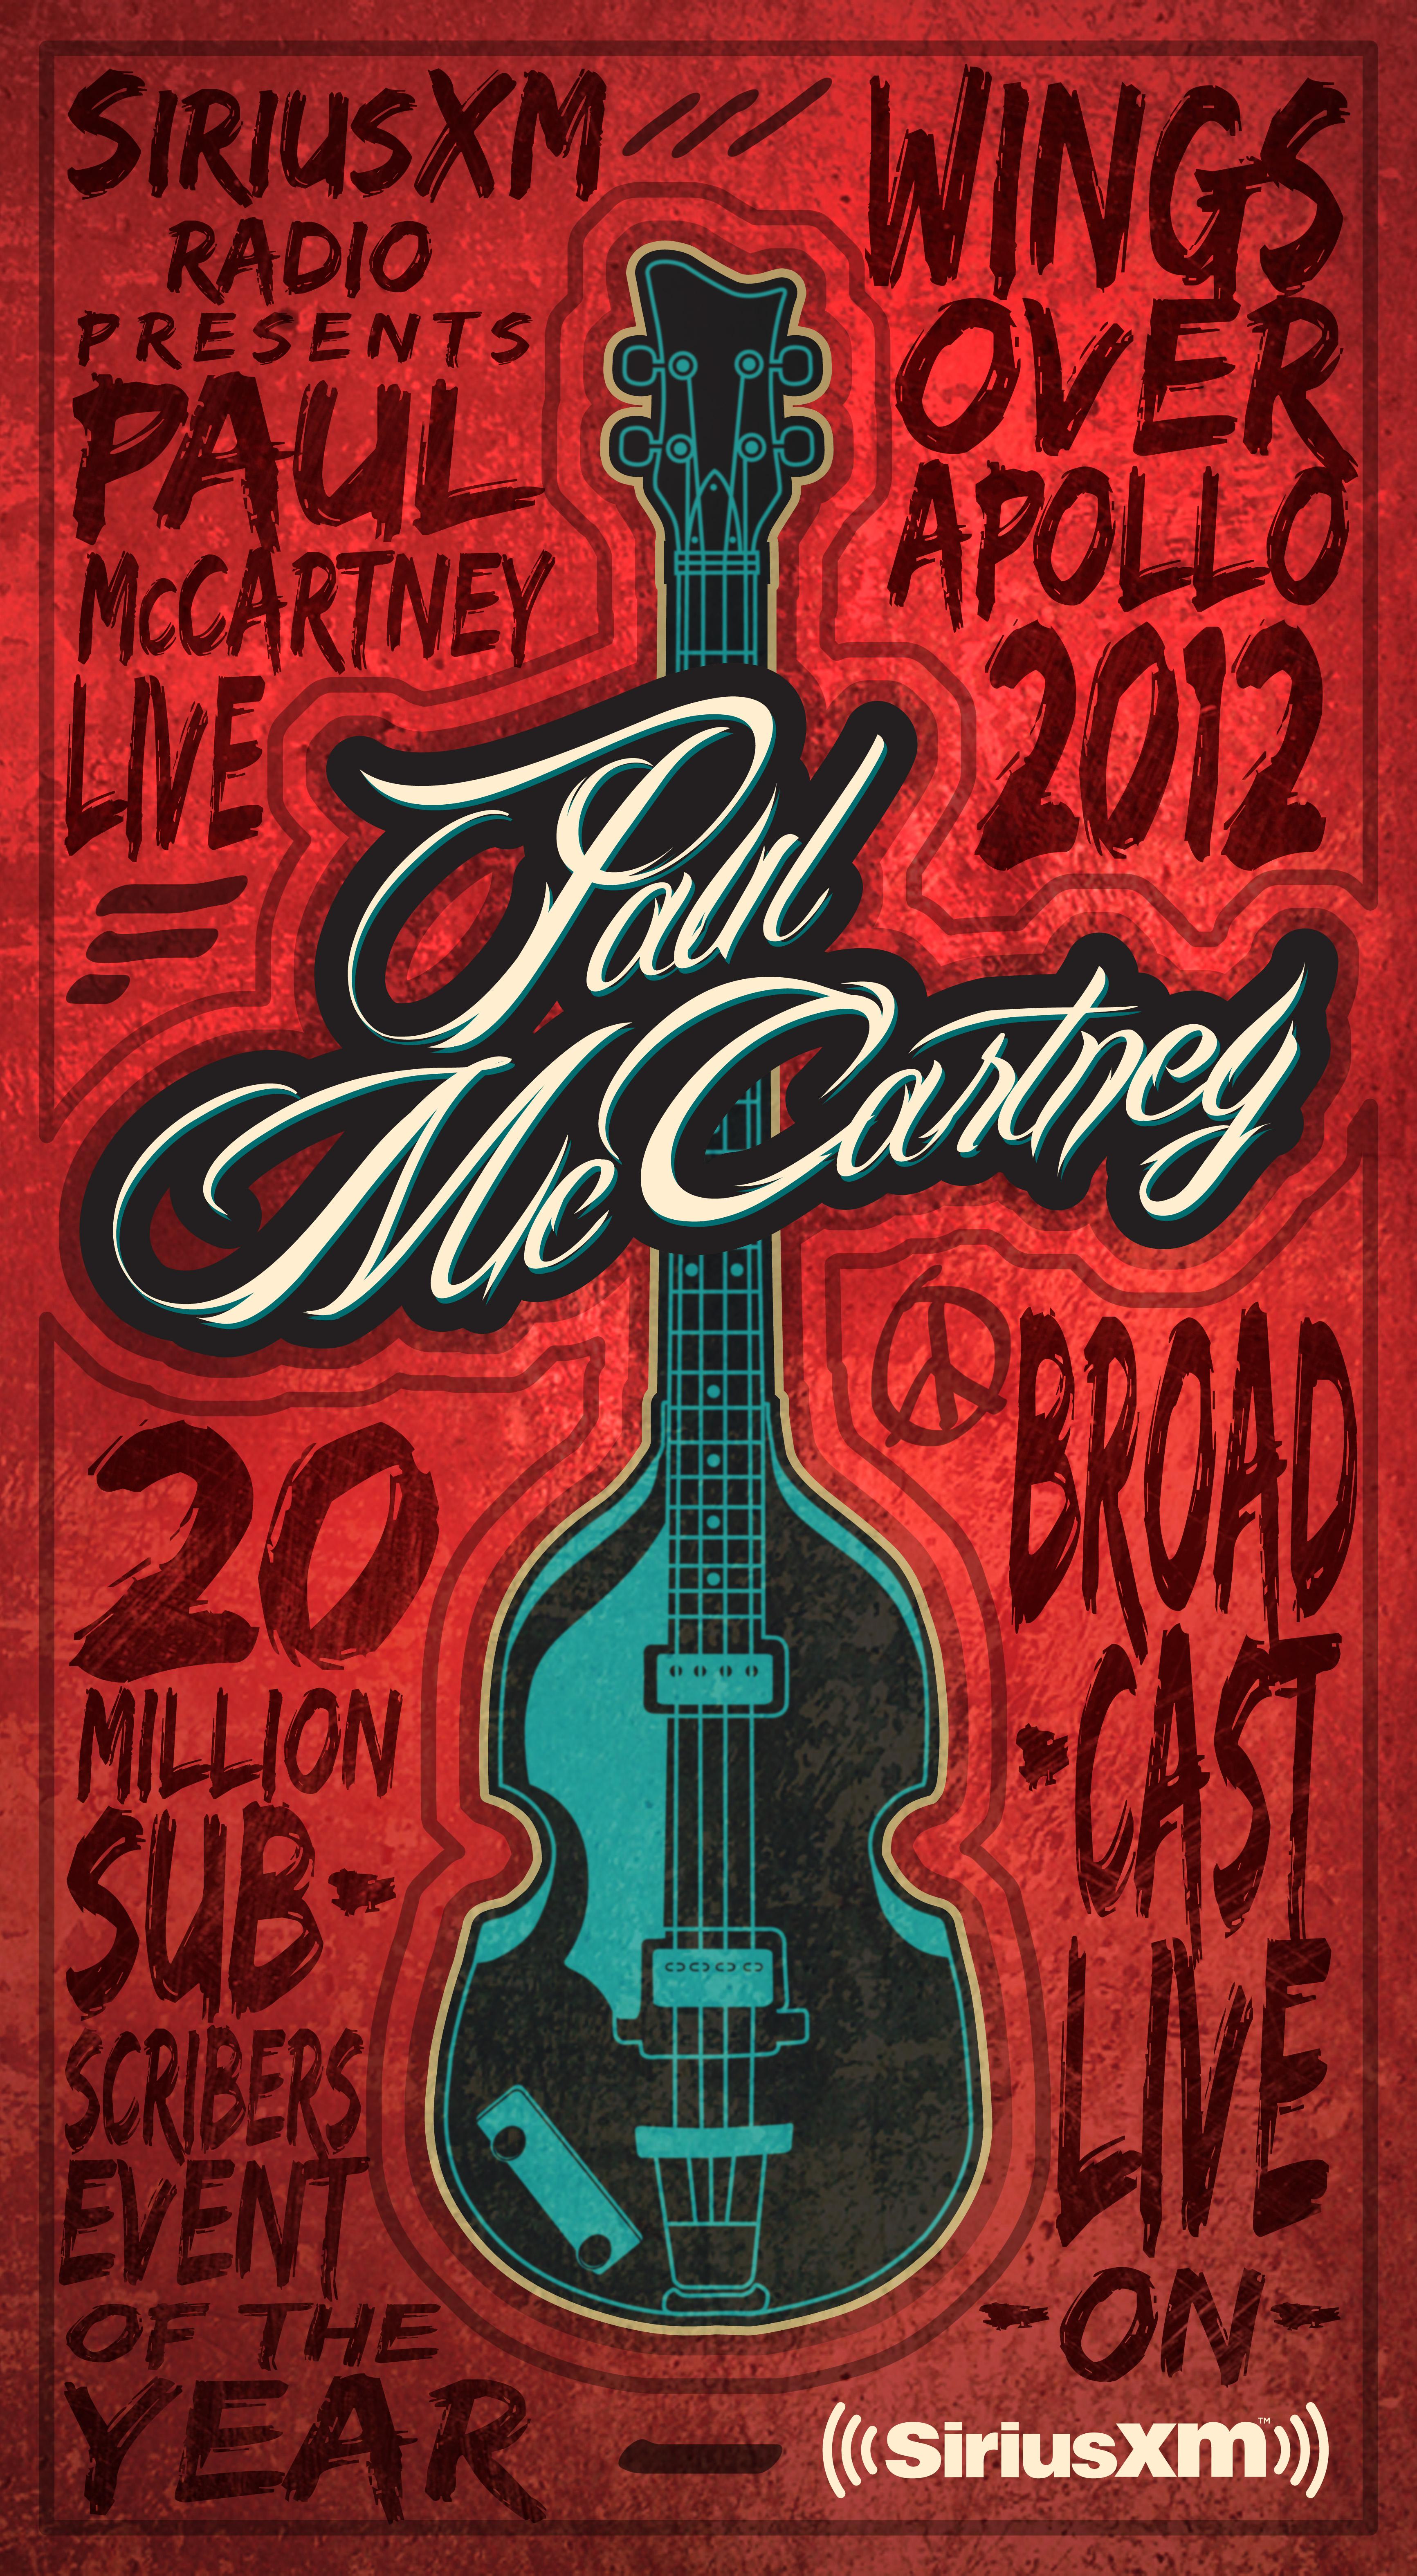 Paul McCartney Event Key Art